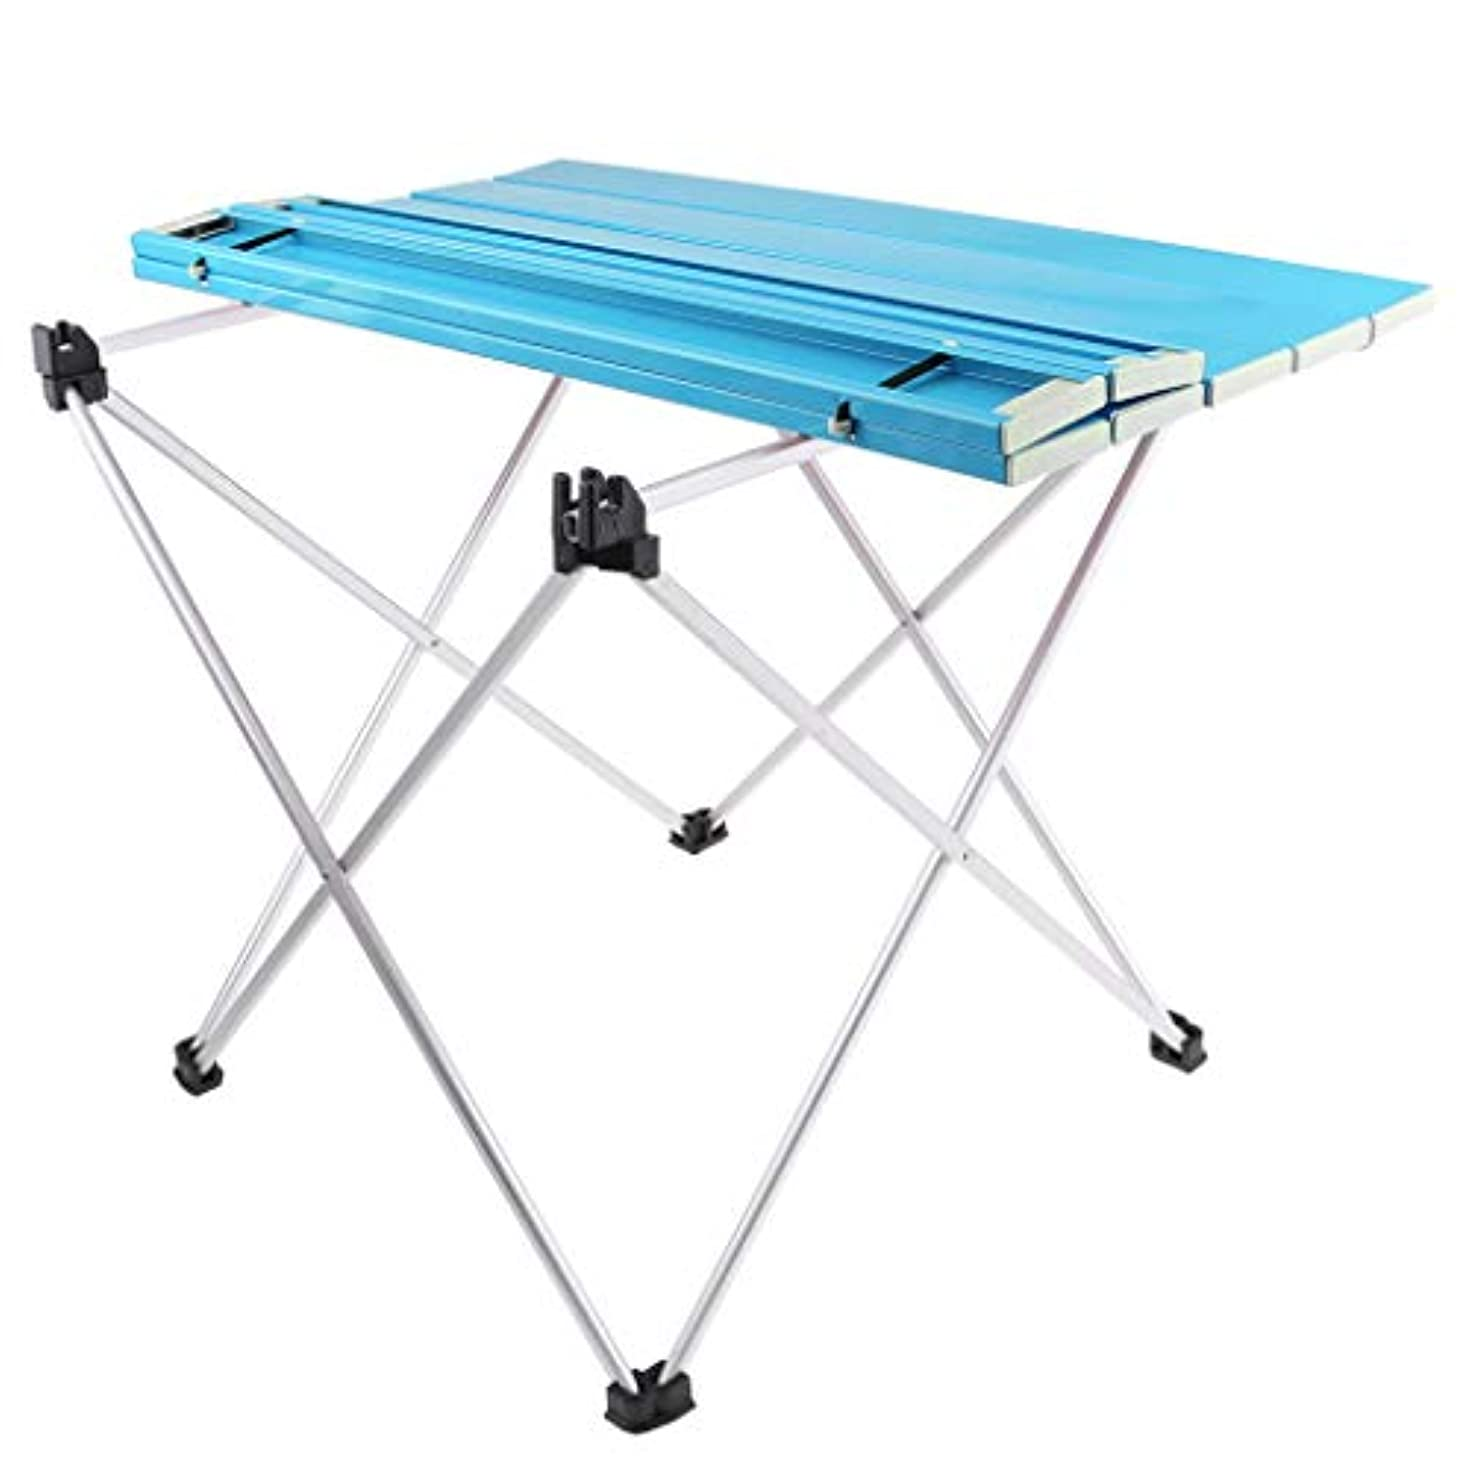 Fenteer 折りたたみ キャンプデスク ピクニックテーブル 全2サイズ